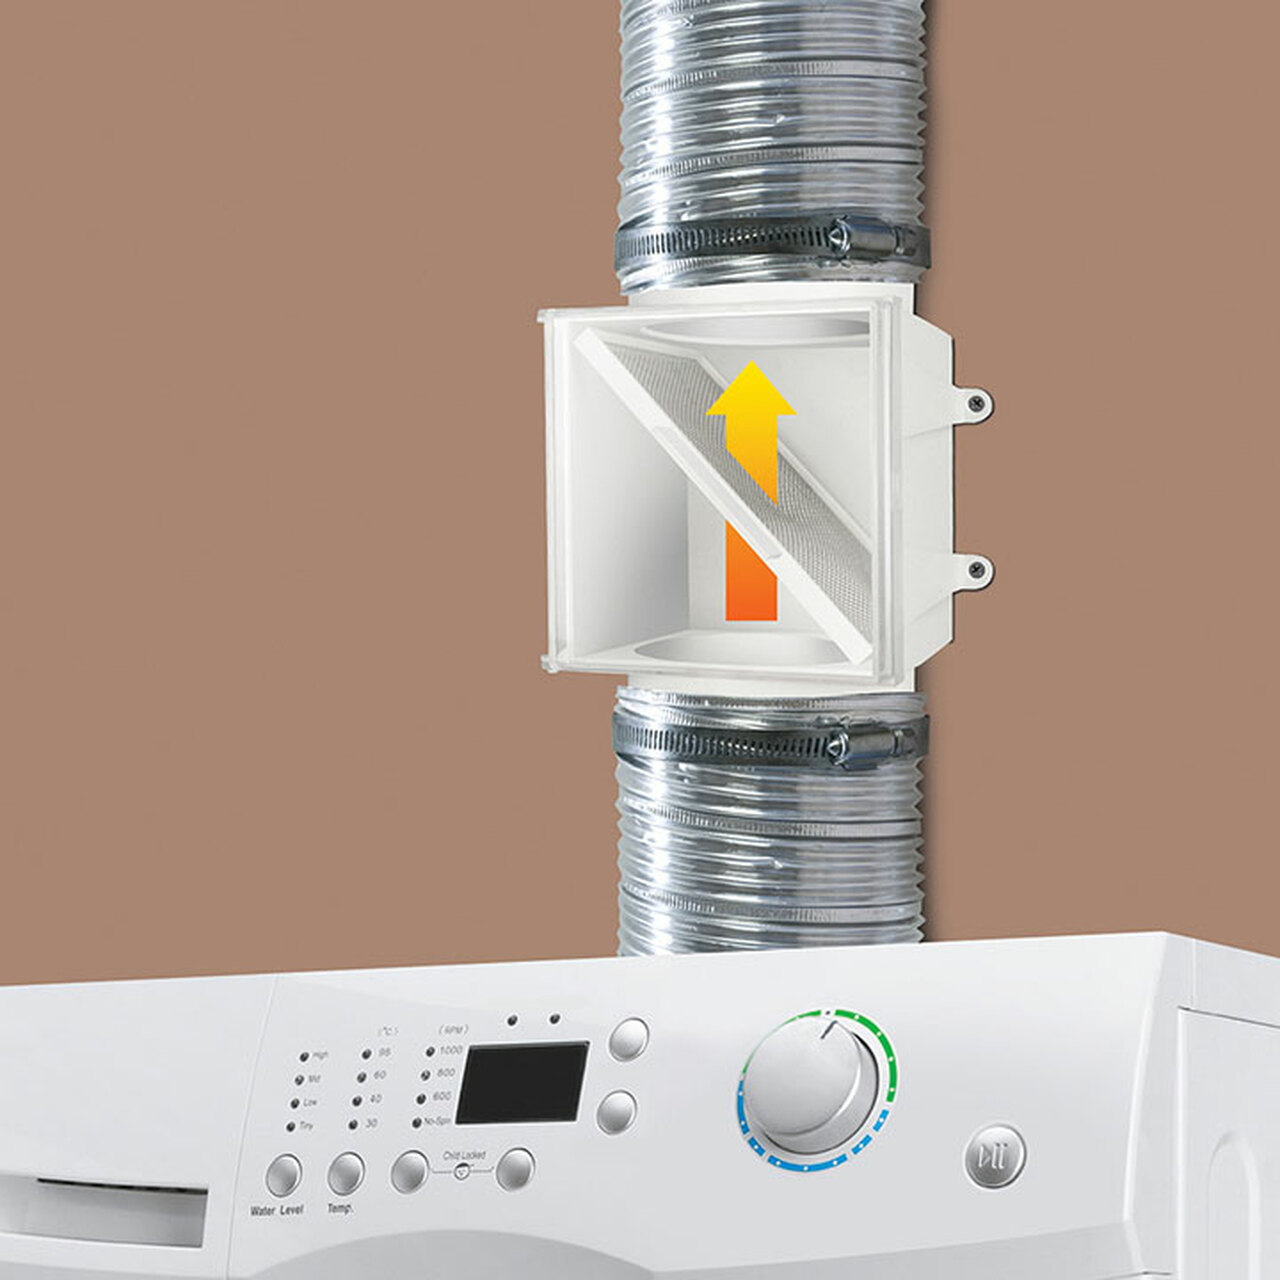 PCLT4WZW Proclean Dryer Duct Lint Trap -  How it works